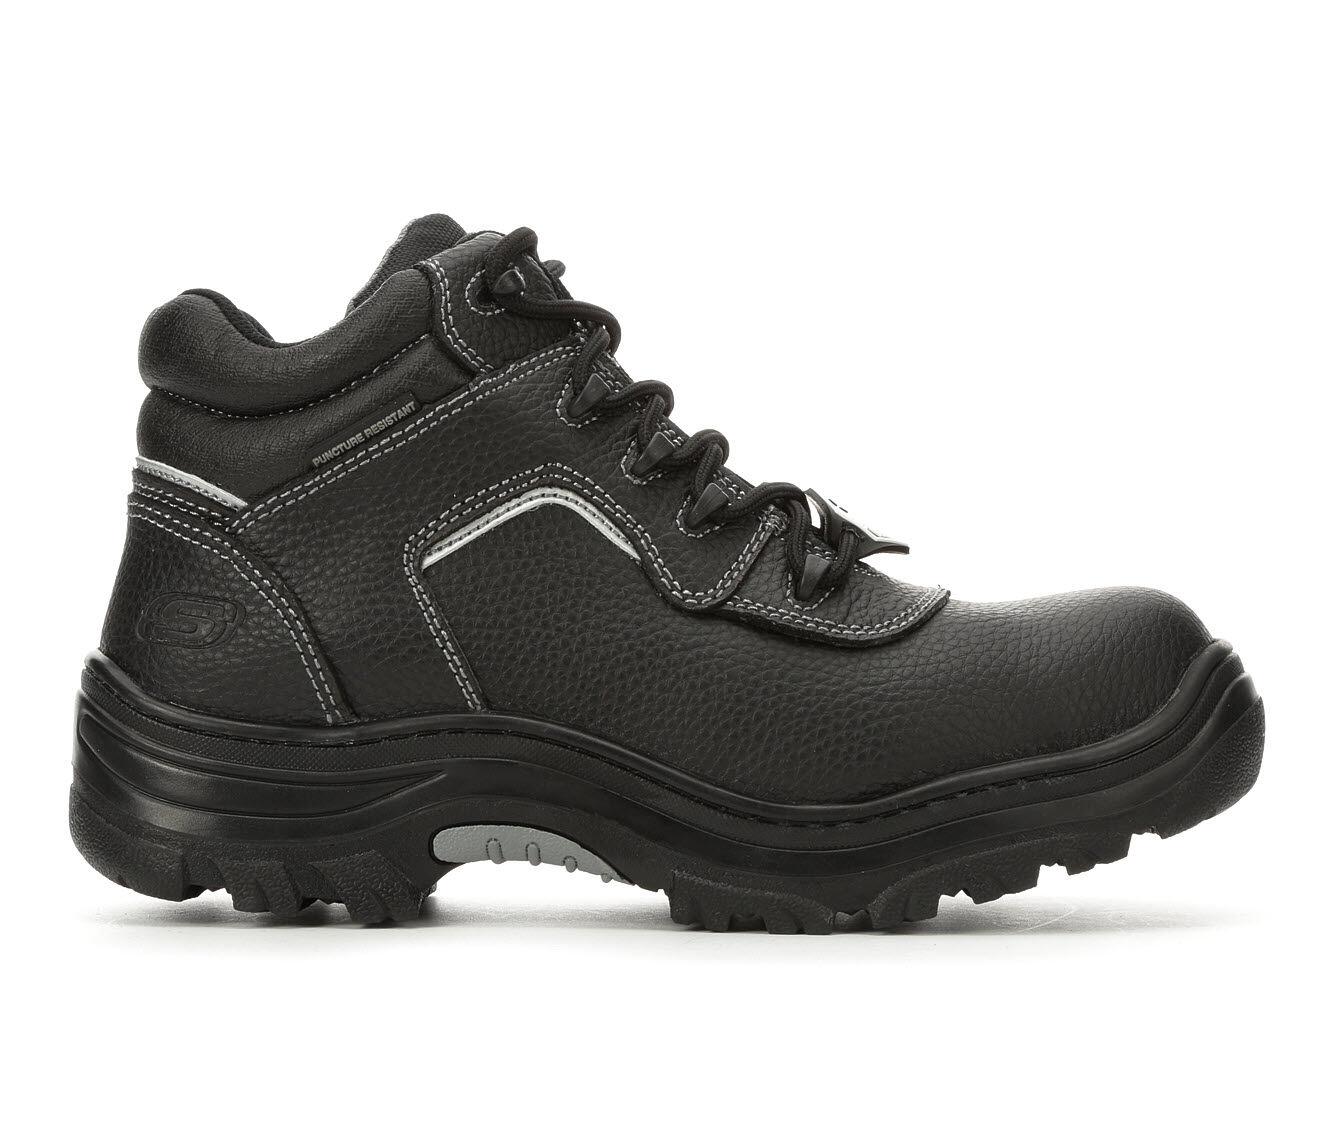 Price Reduced Men's Skechers Work Workshire Burgin Sosder 77144 Work Boots Black